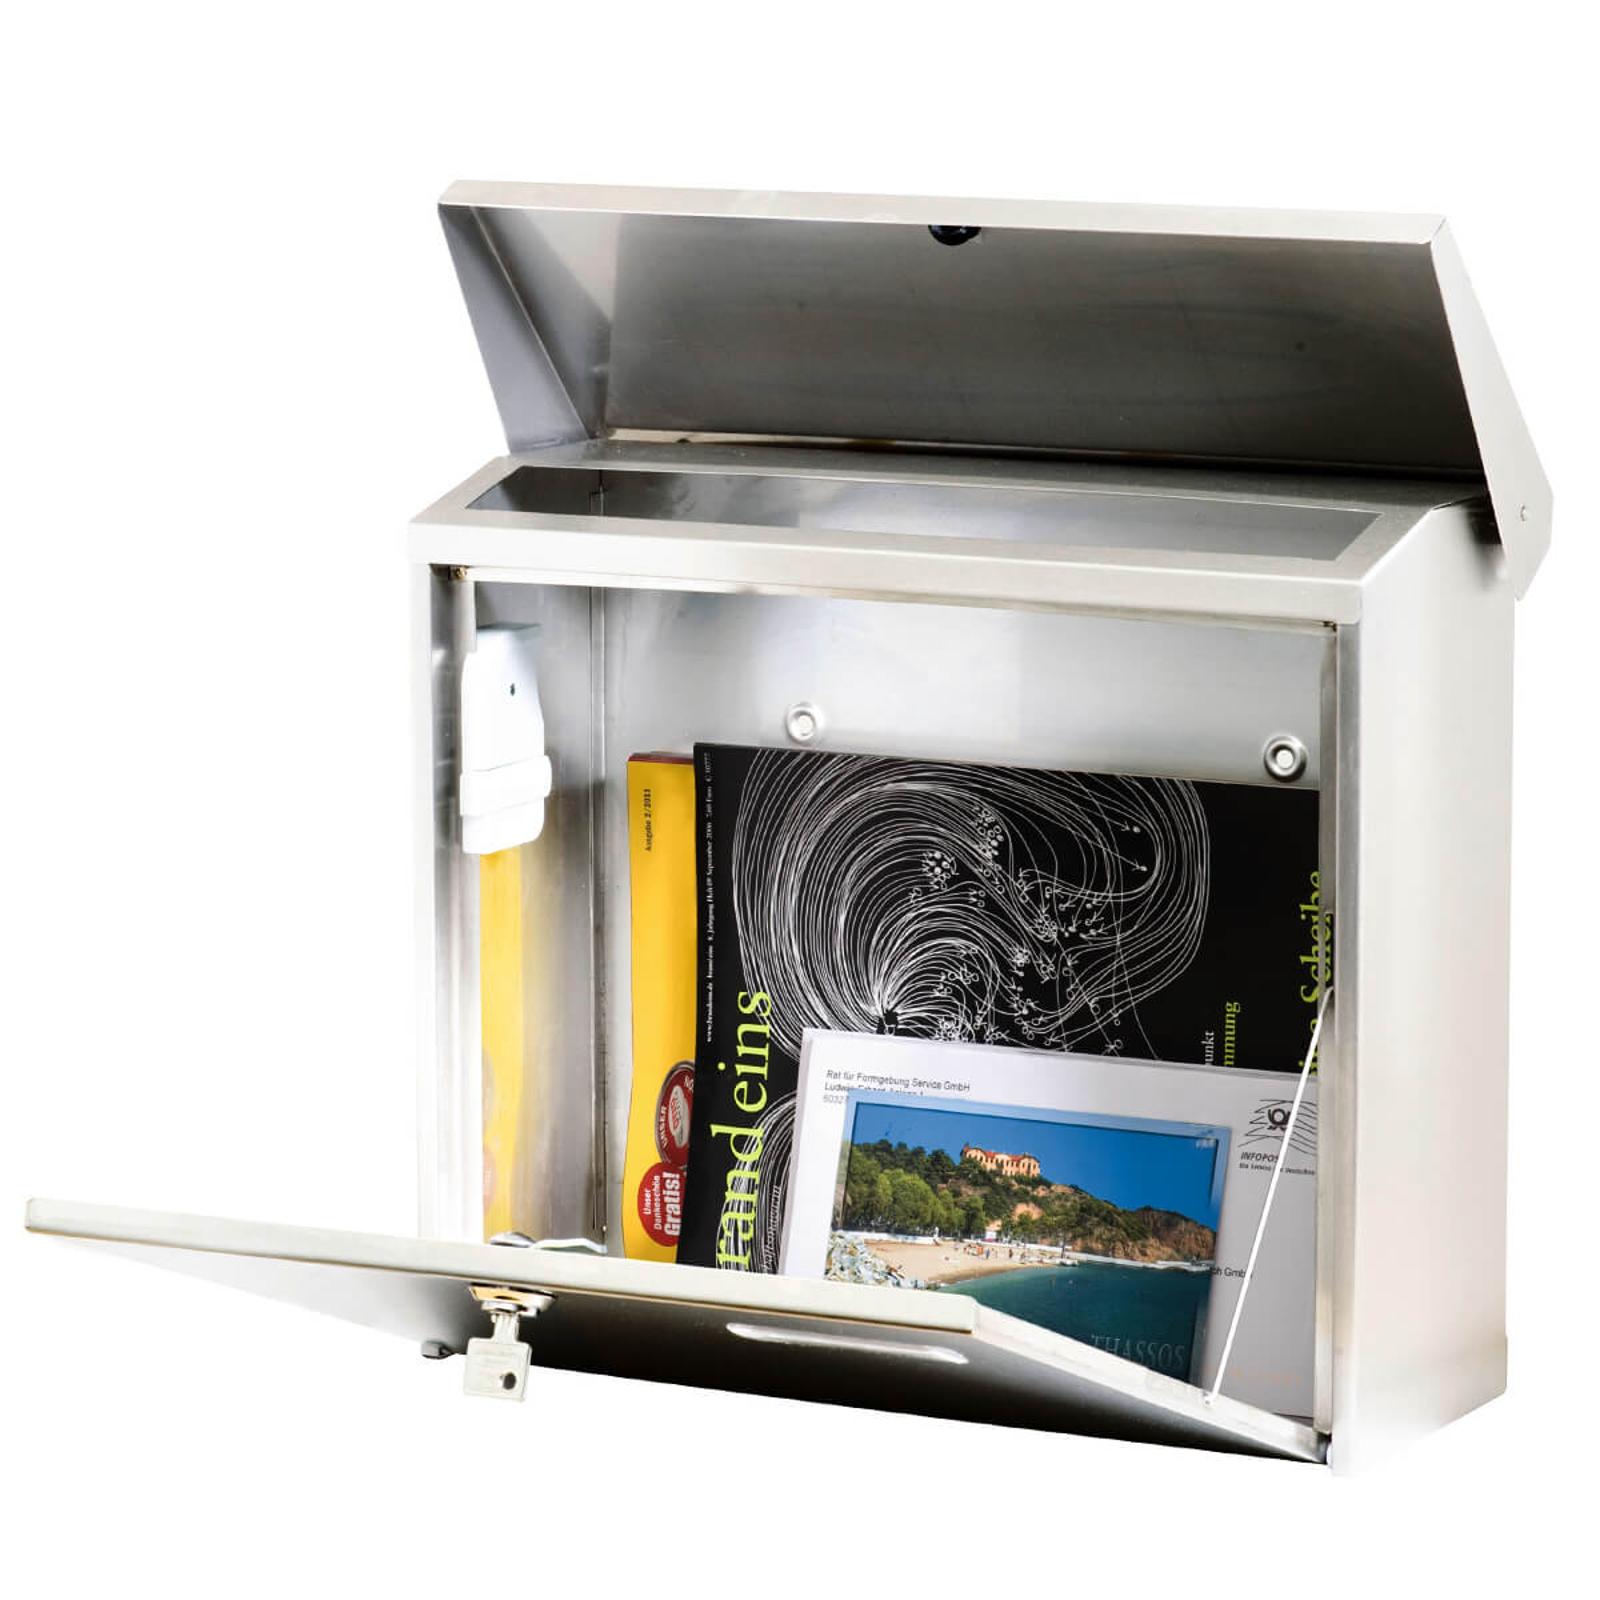 Poštová schránka Olymp v bielom